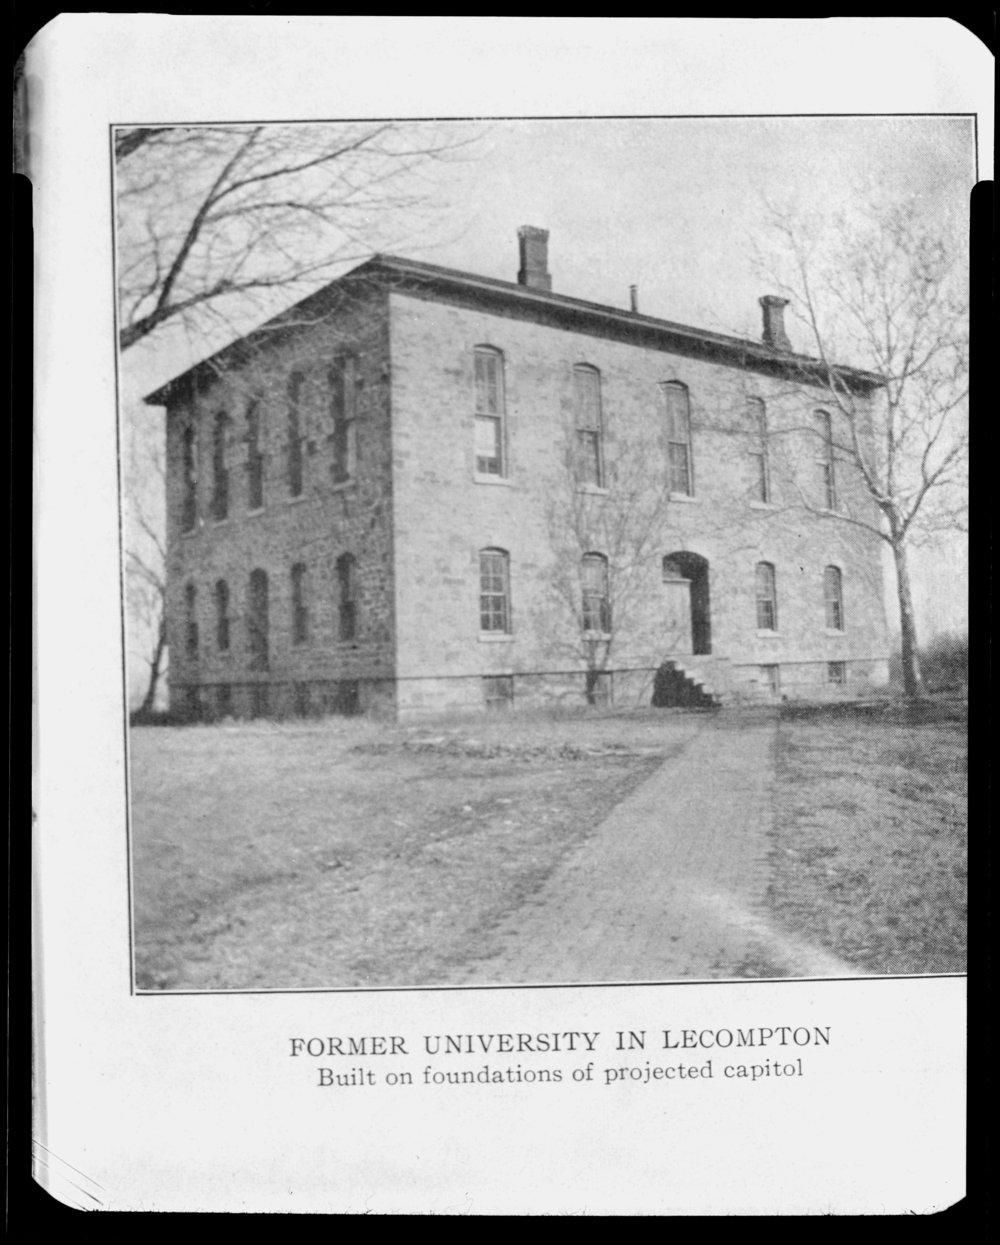 Several views of Lane University in Lecompton, Kansas - *30